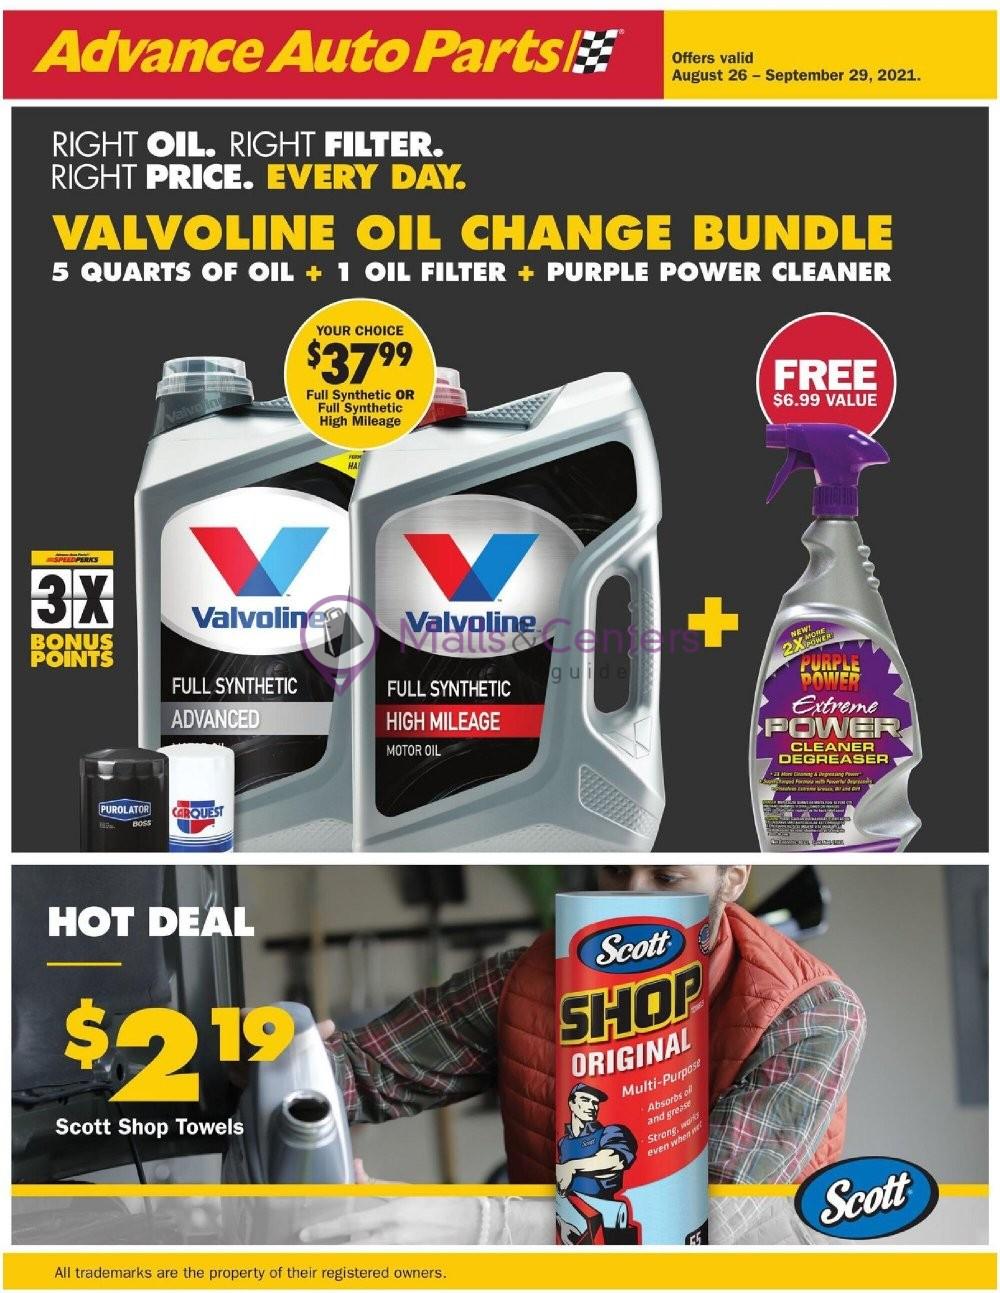 weekly ads Advance Auto Parts - page 1 - mallscenters.com